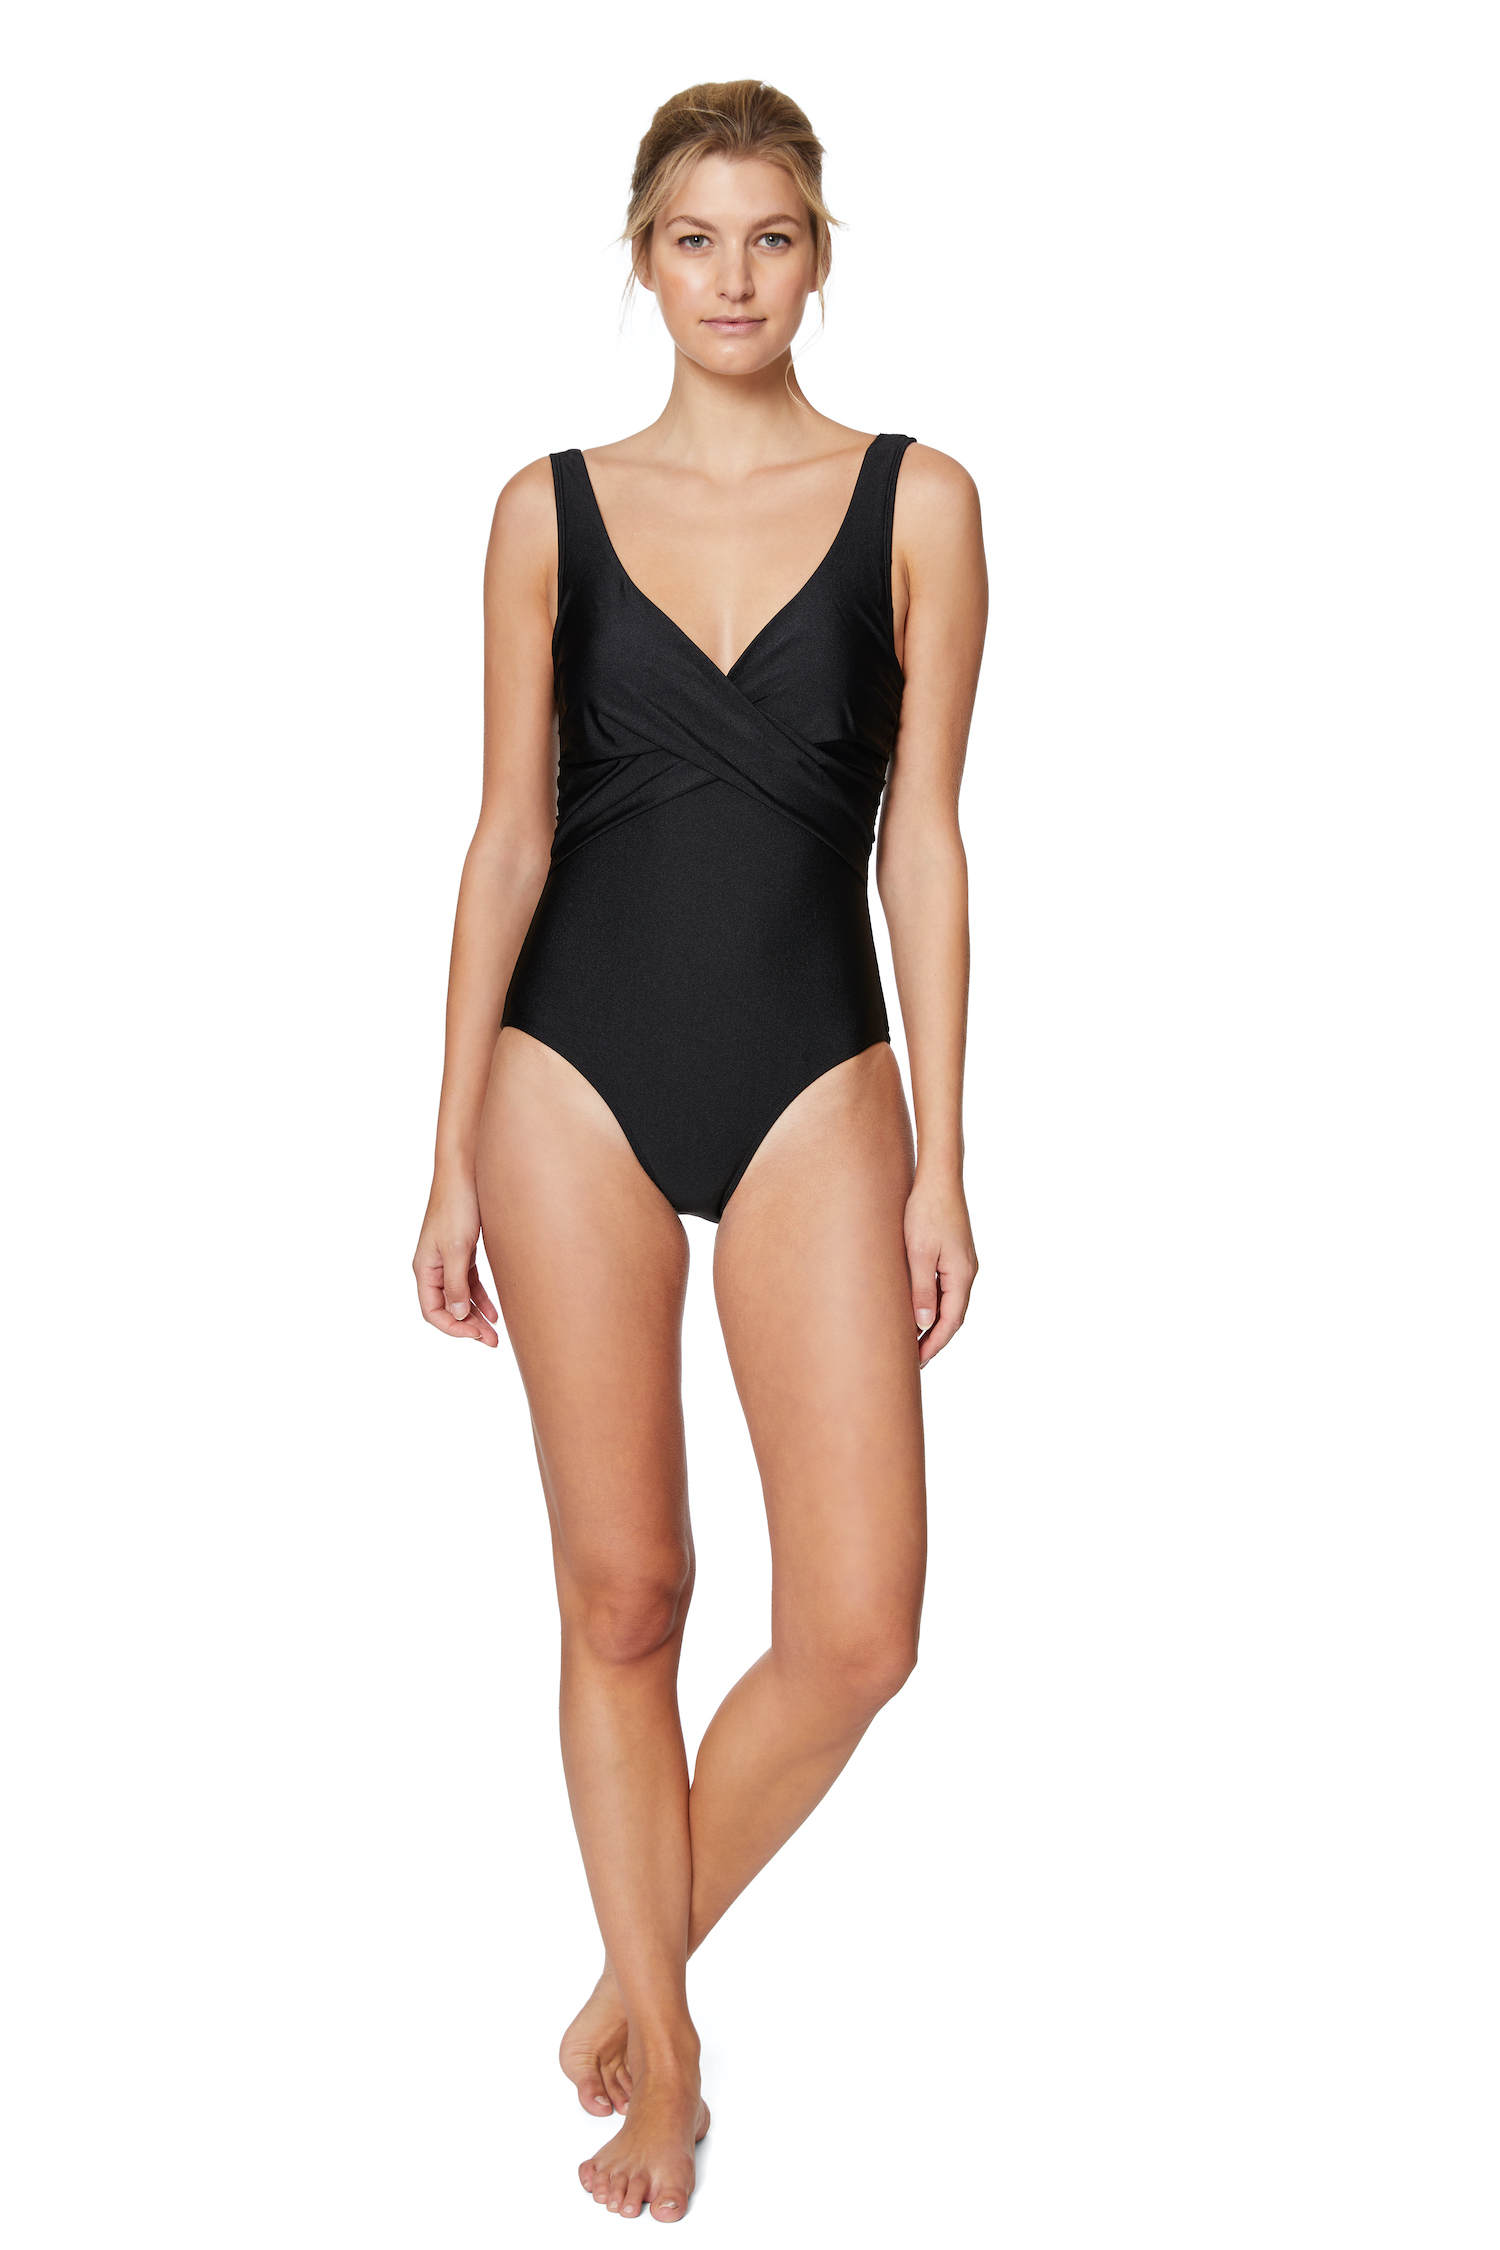 Tahari® Ultra Luxe Surplice One Piece Swimsuit - Black - Front